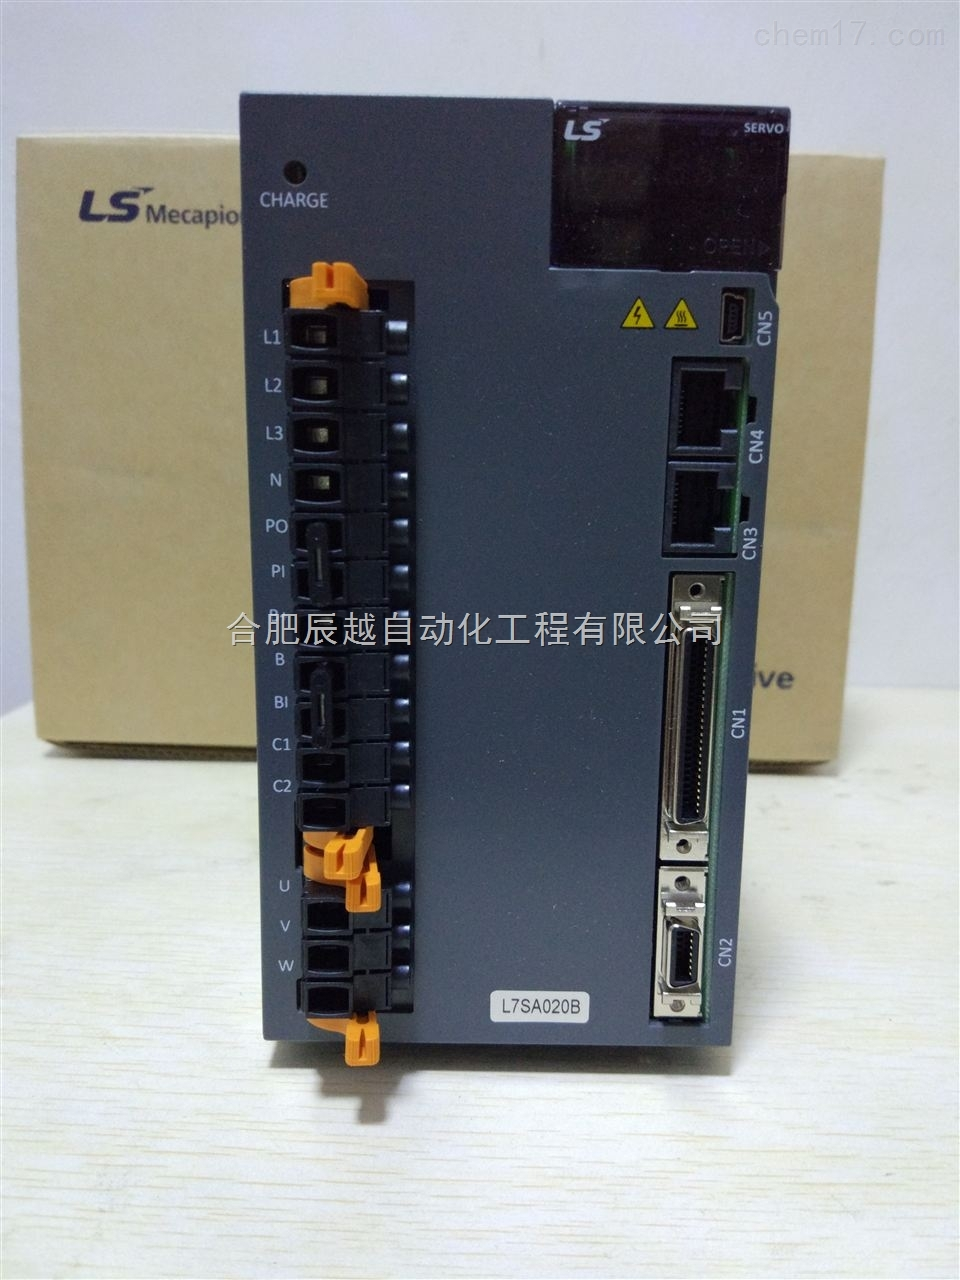 L7SA035A华南代理韩国LS迈克彼恩伺服电机控制器